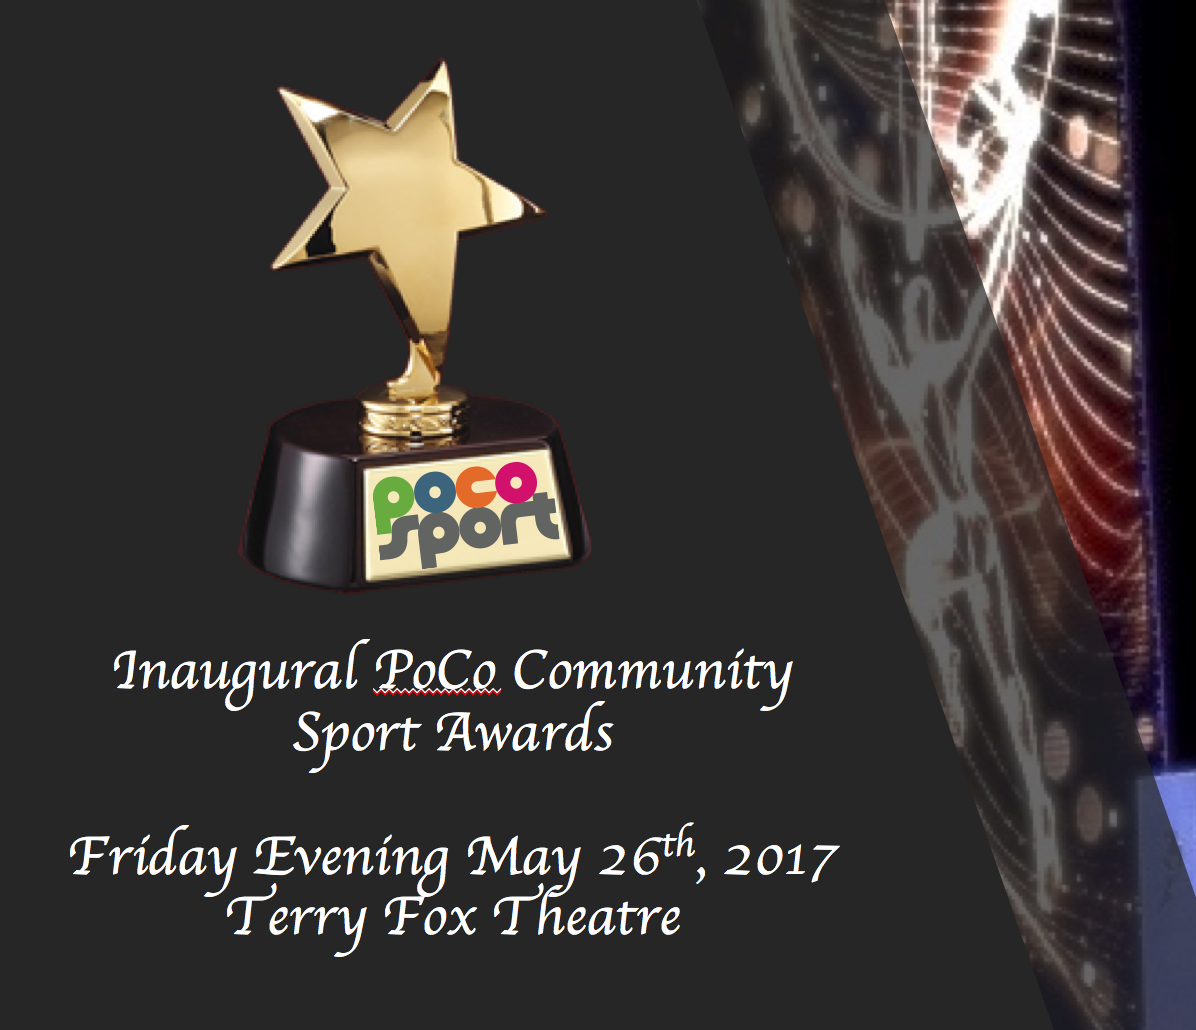 Inaugural PoCo Community Sport Awards Coming in May